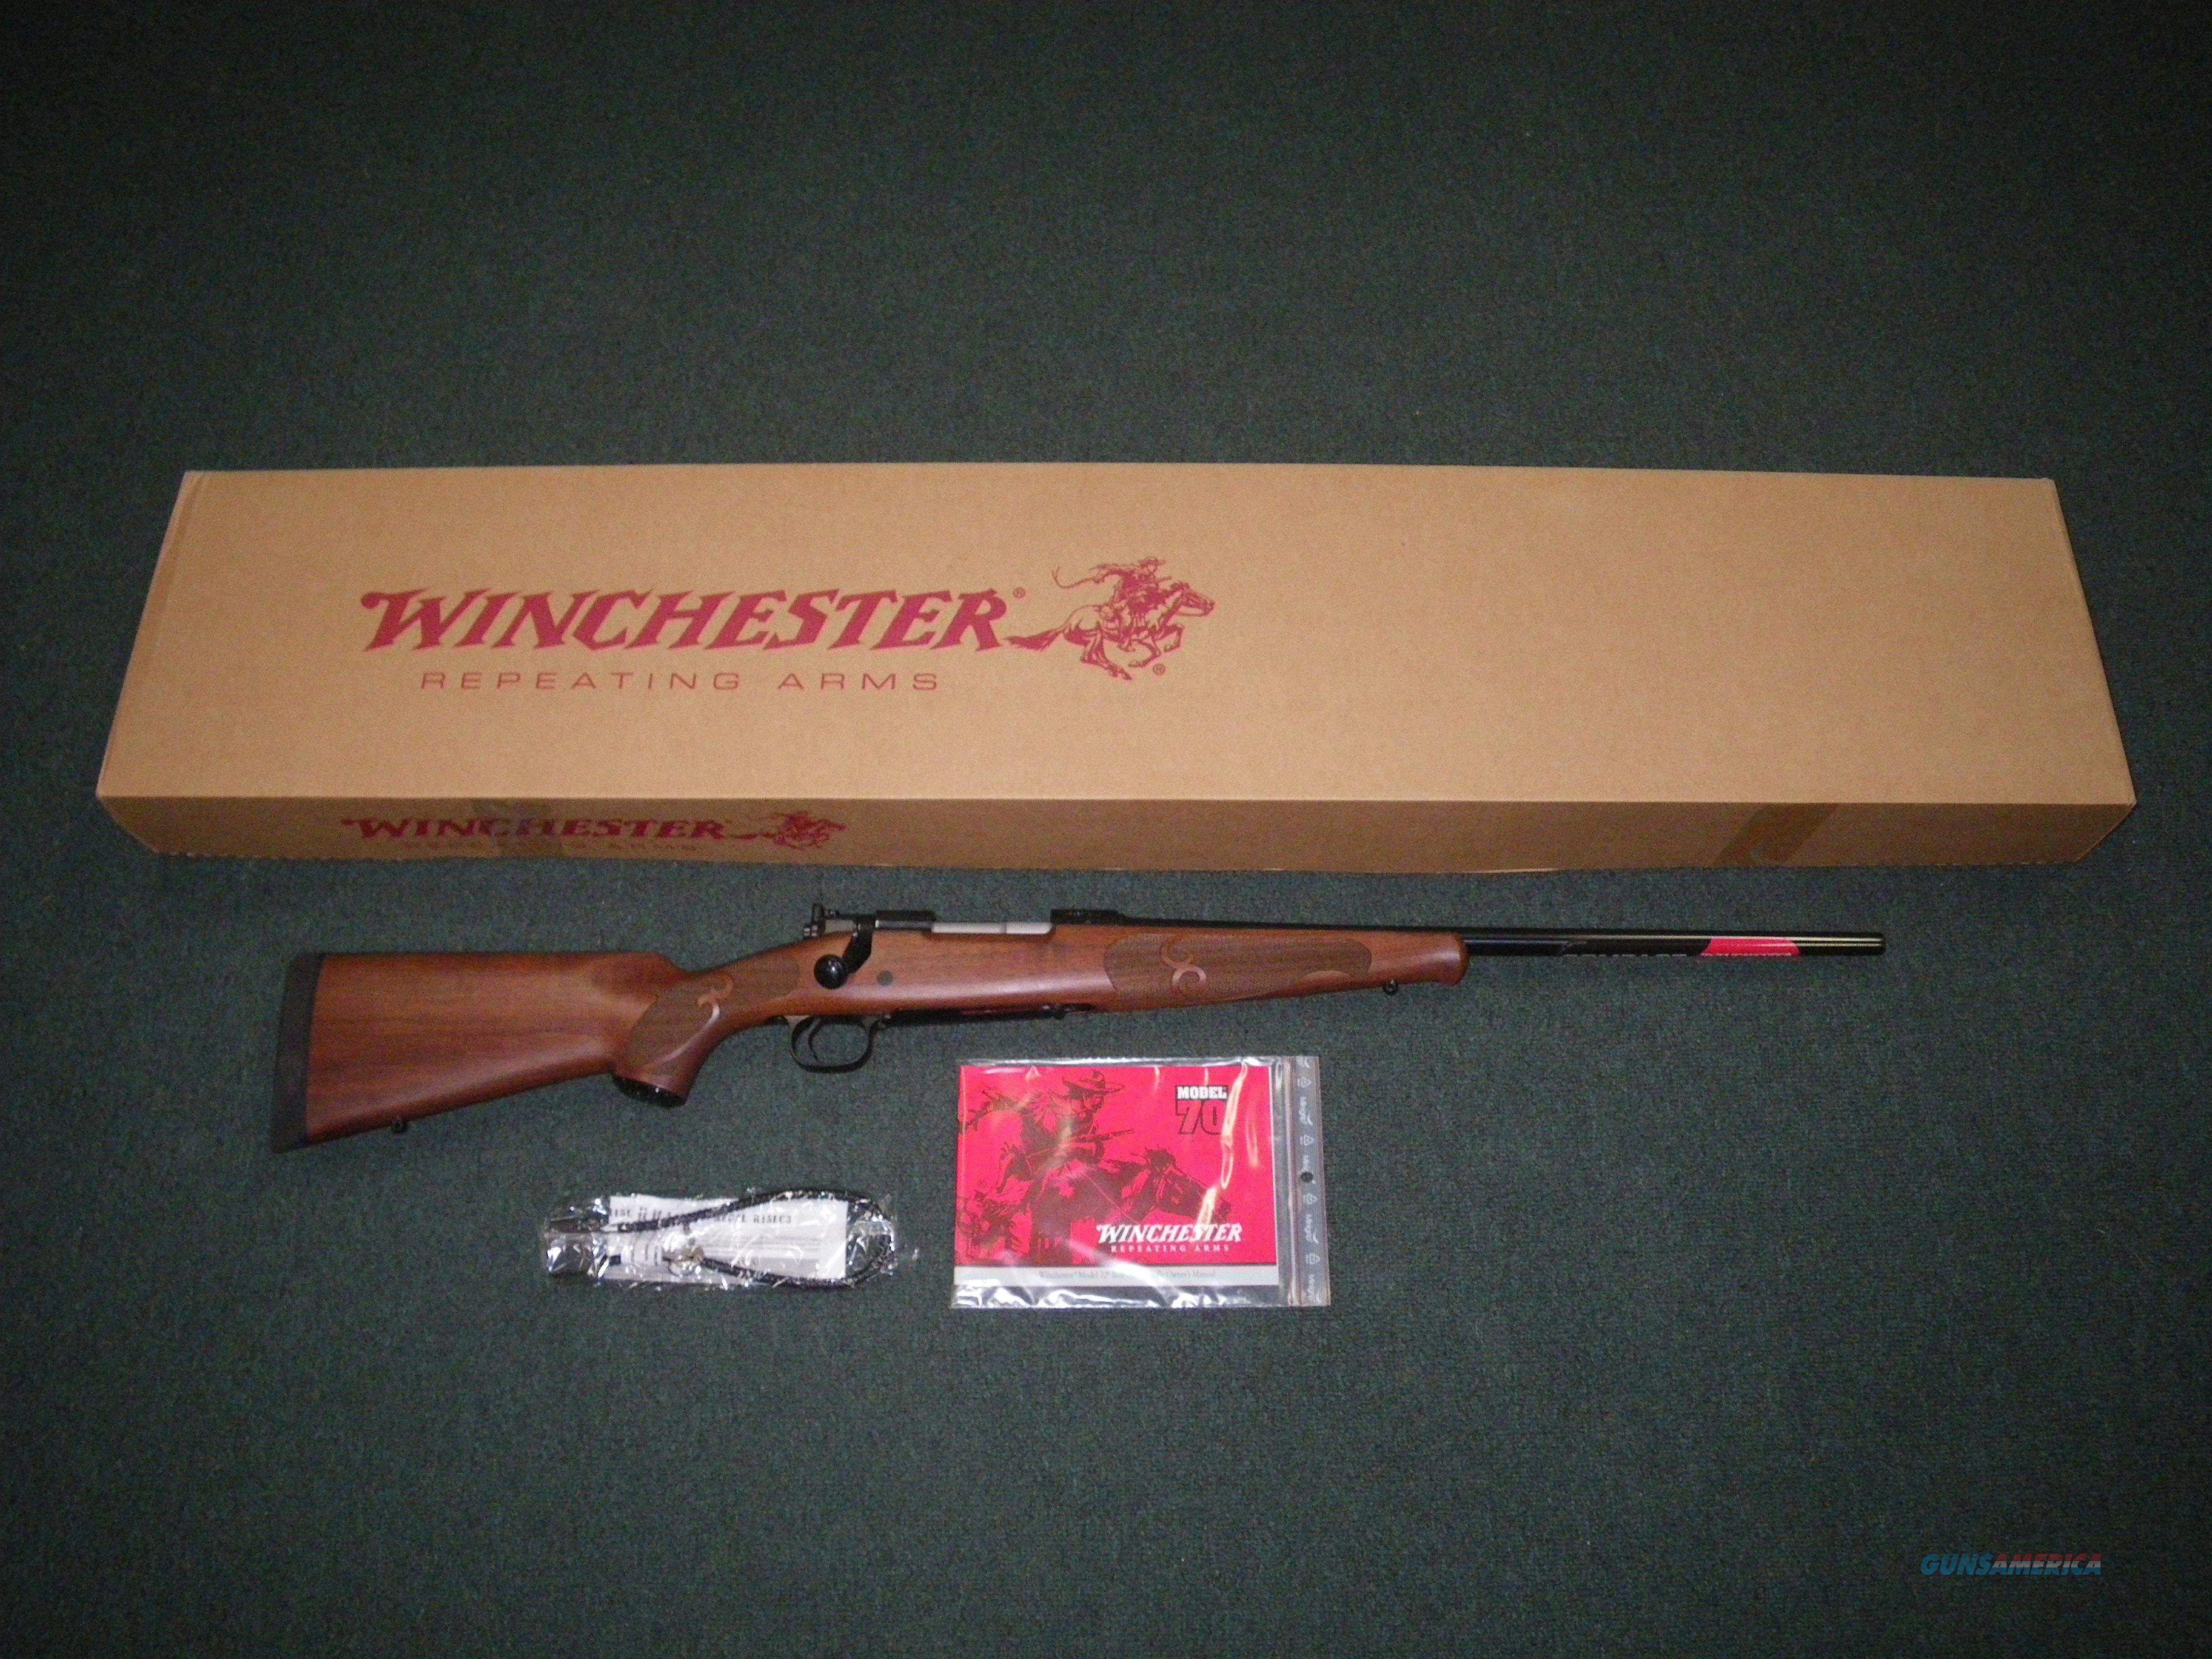 "Winchester Model 70 Fthrwt Compact 308 Win 20"" NEW #535201220  Guns > Rifles > Winchester Rifles - Modern Bolt/Auto/Single > Model 70 > Post-64"